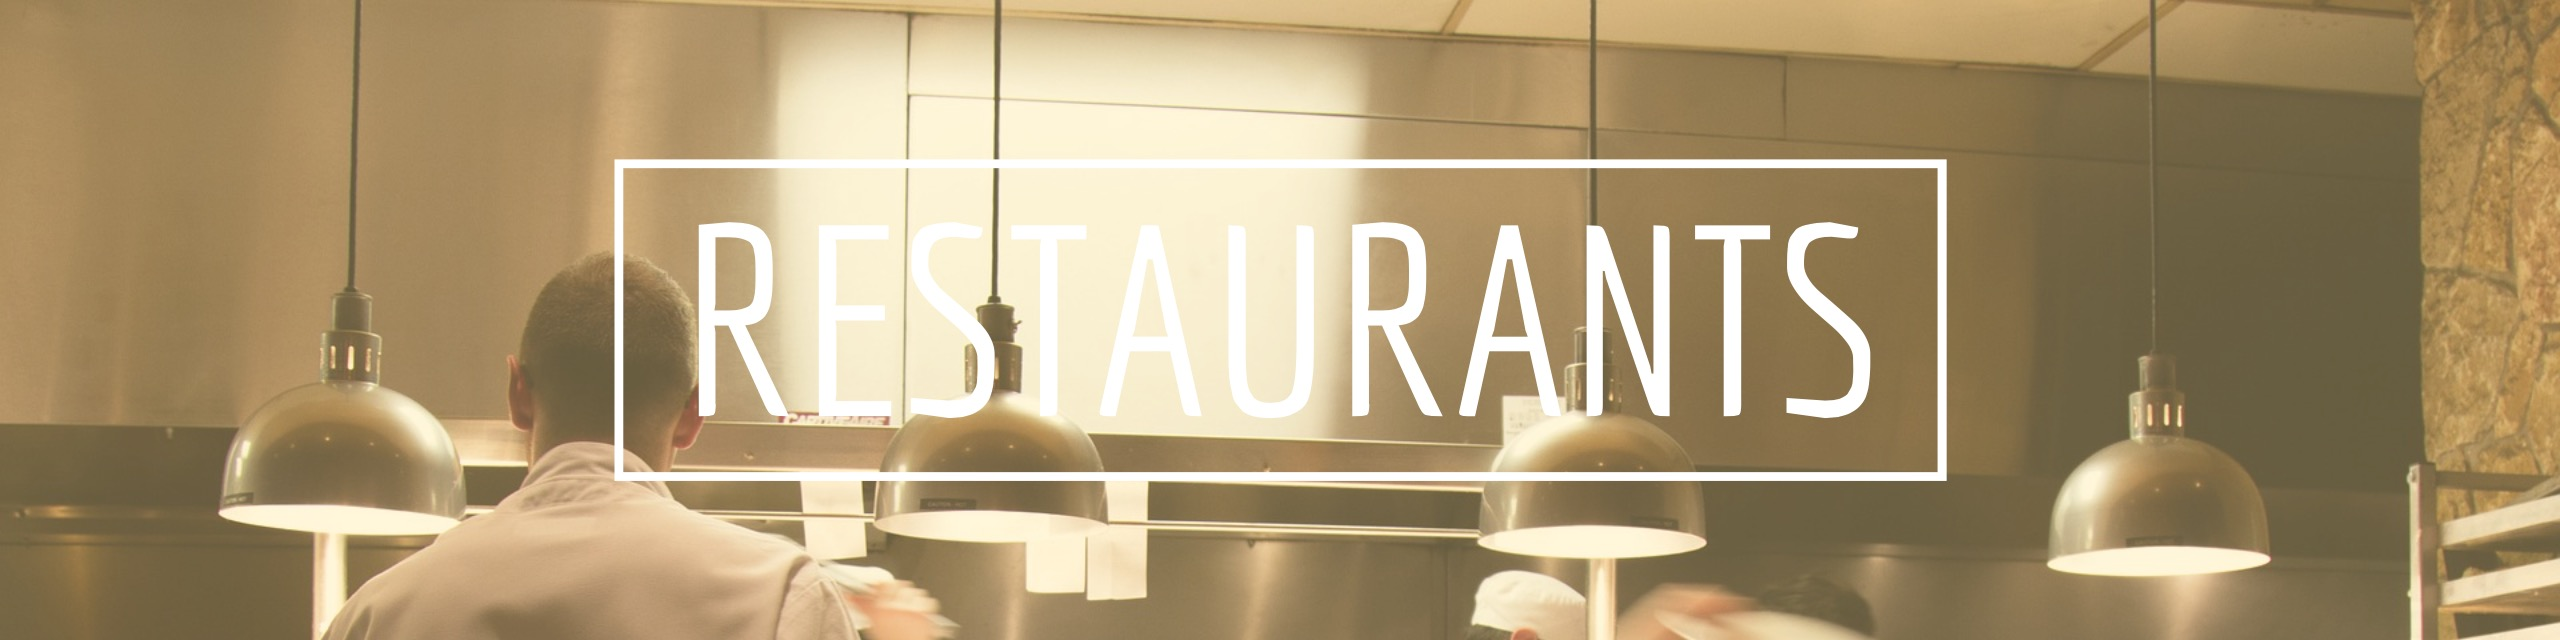 restaurants-use-two-way-radios.jpg